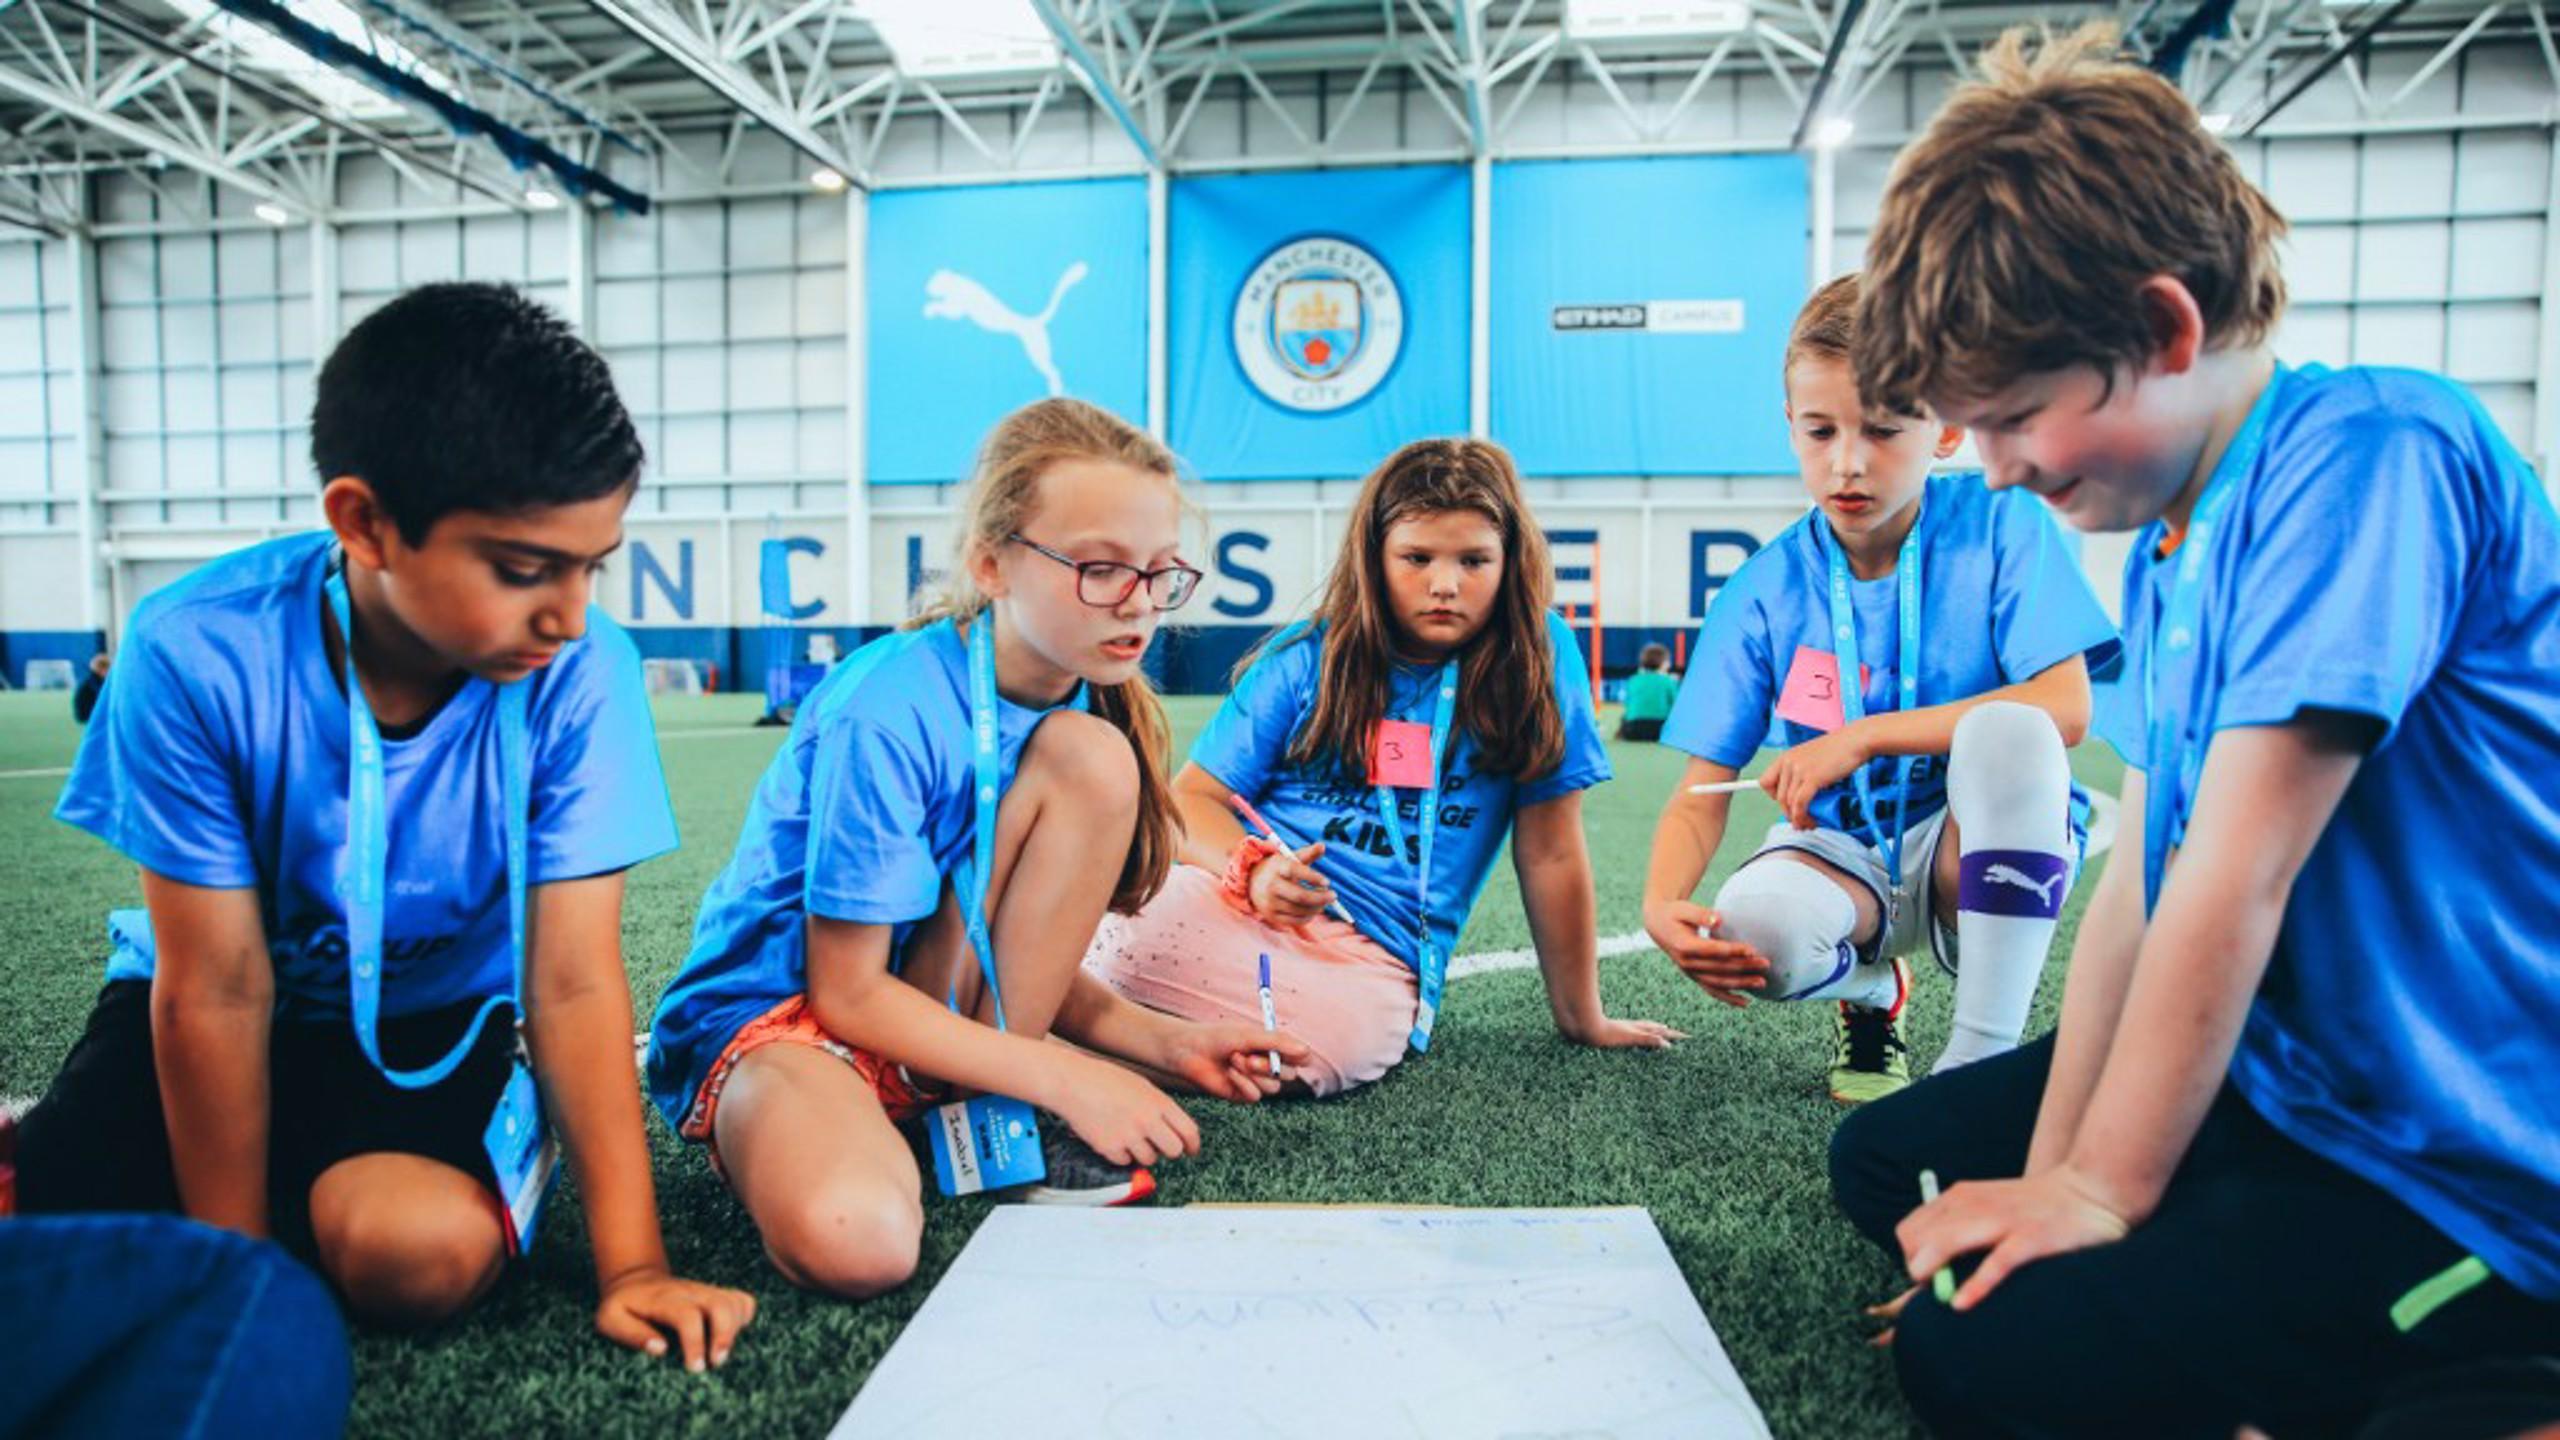 HARD AT WORK: City Startup Challenge Kids